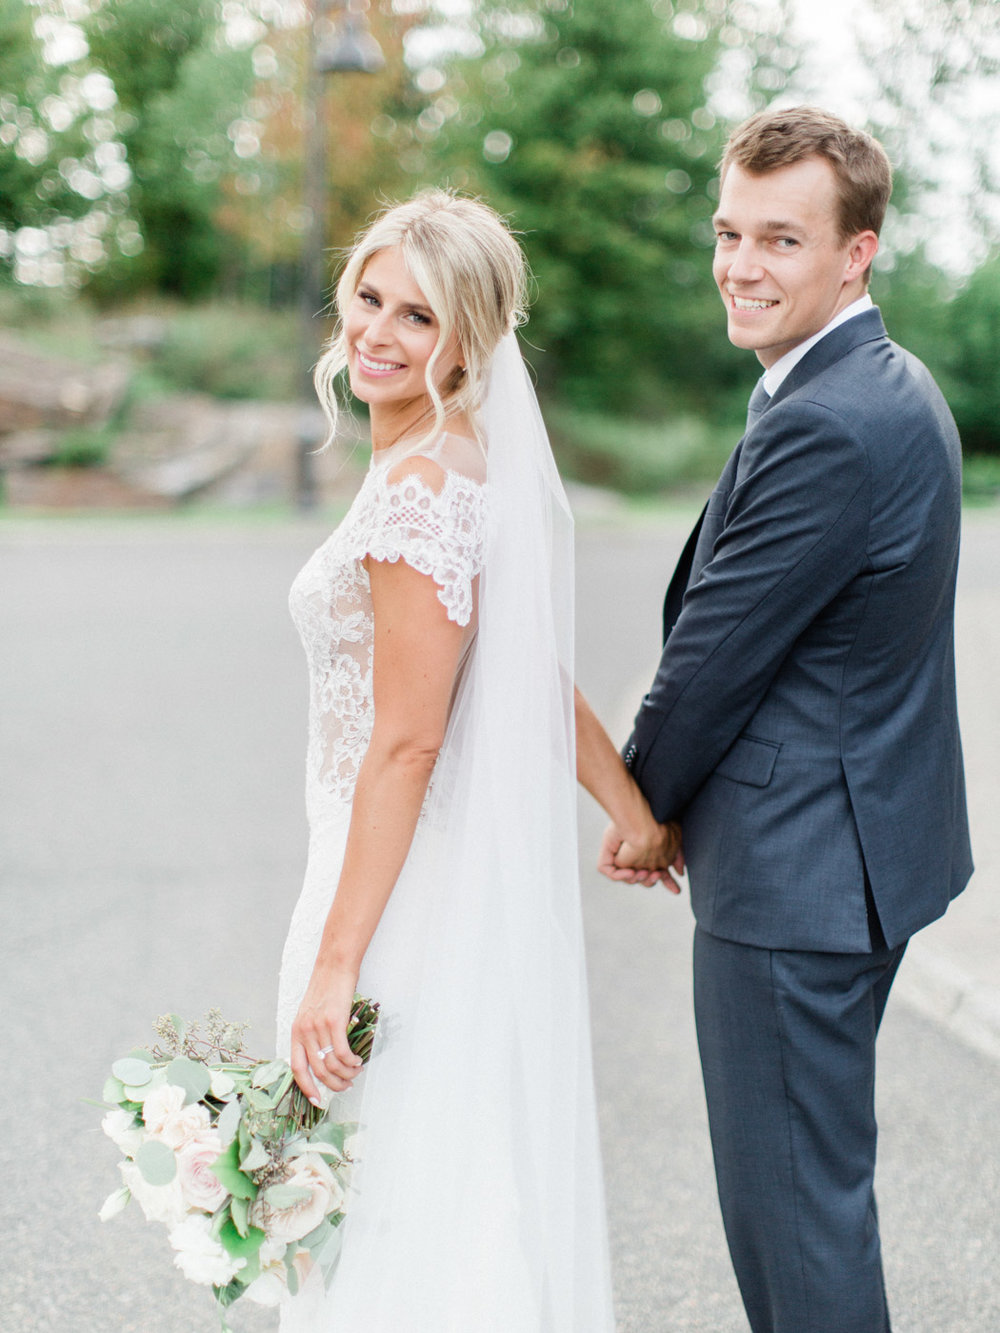 Toronto-Muskoka-wedding-photographer-summery-fun-documentary-the-marriott-rosseau102.jpg